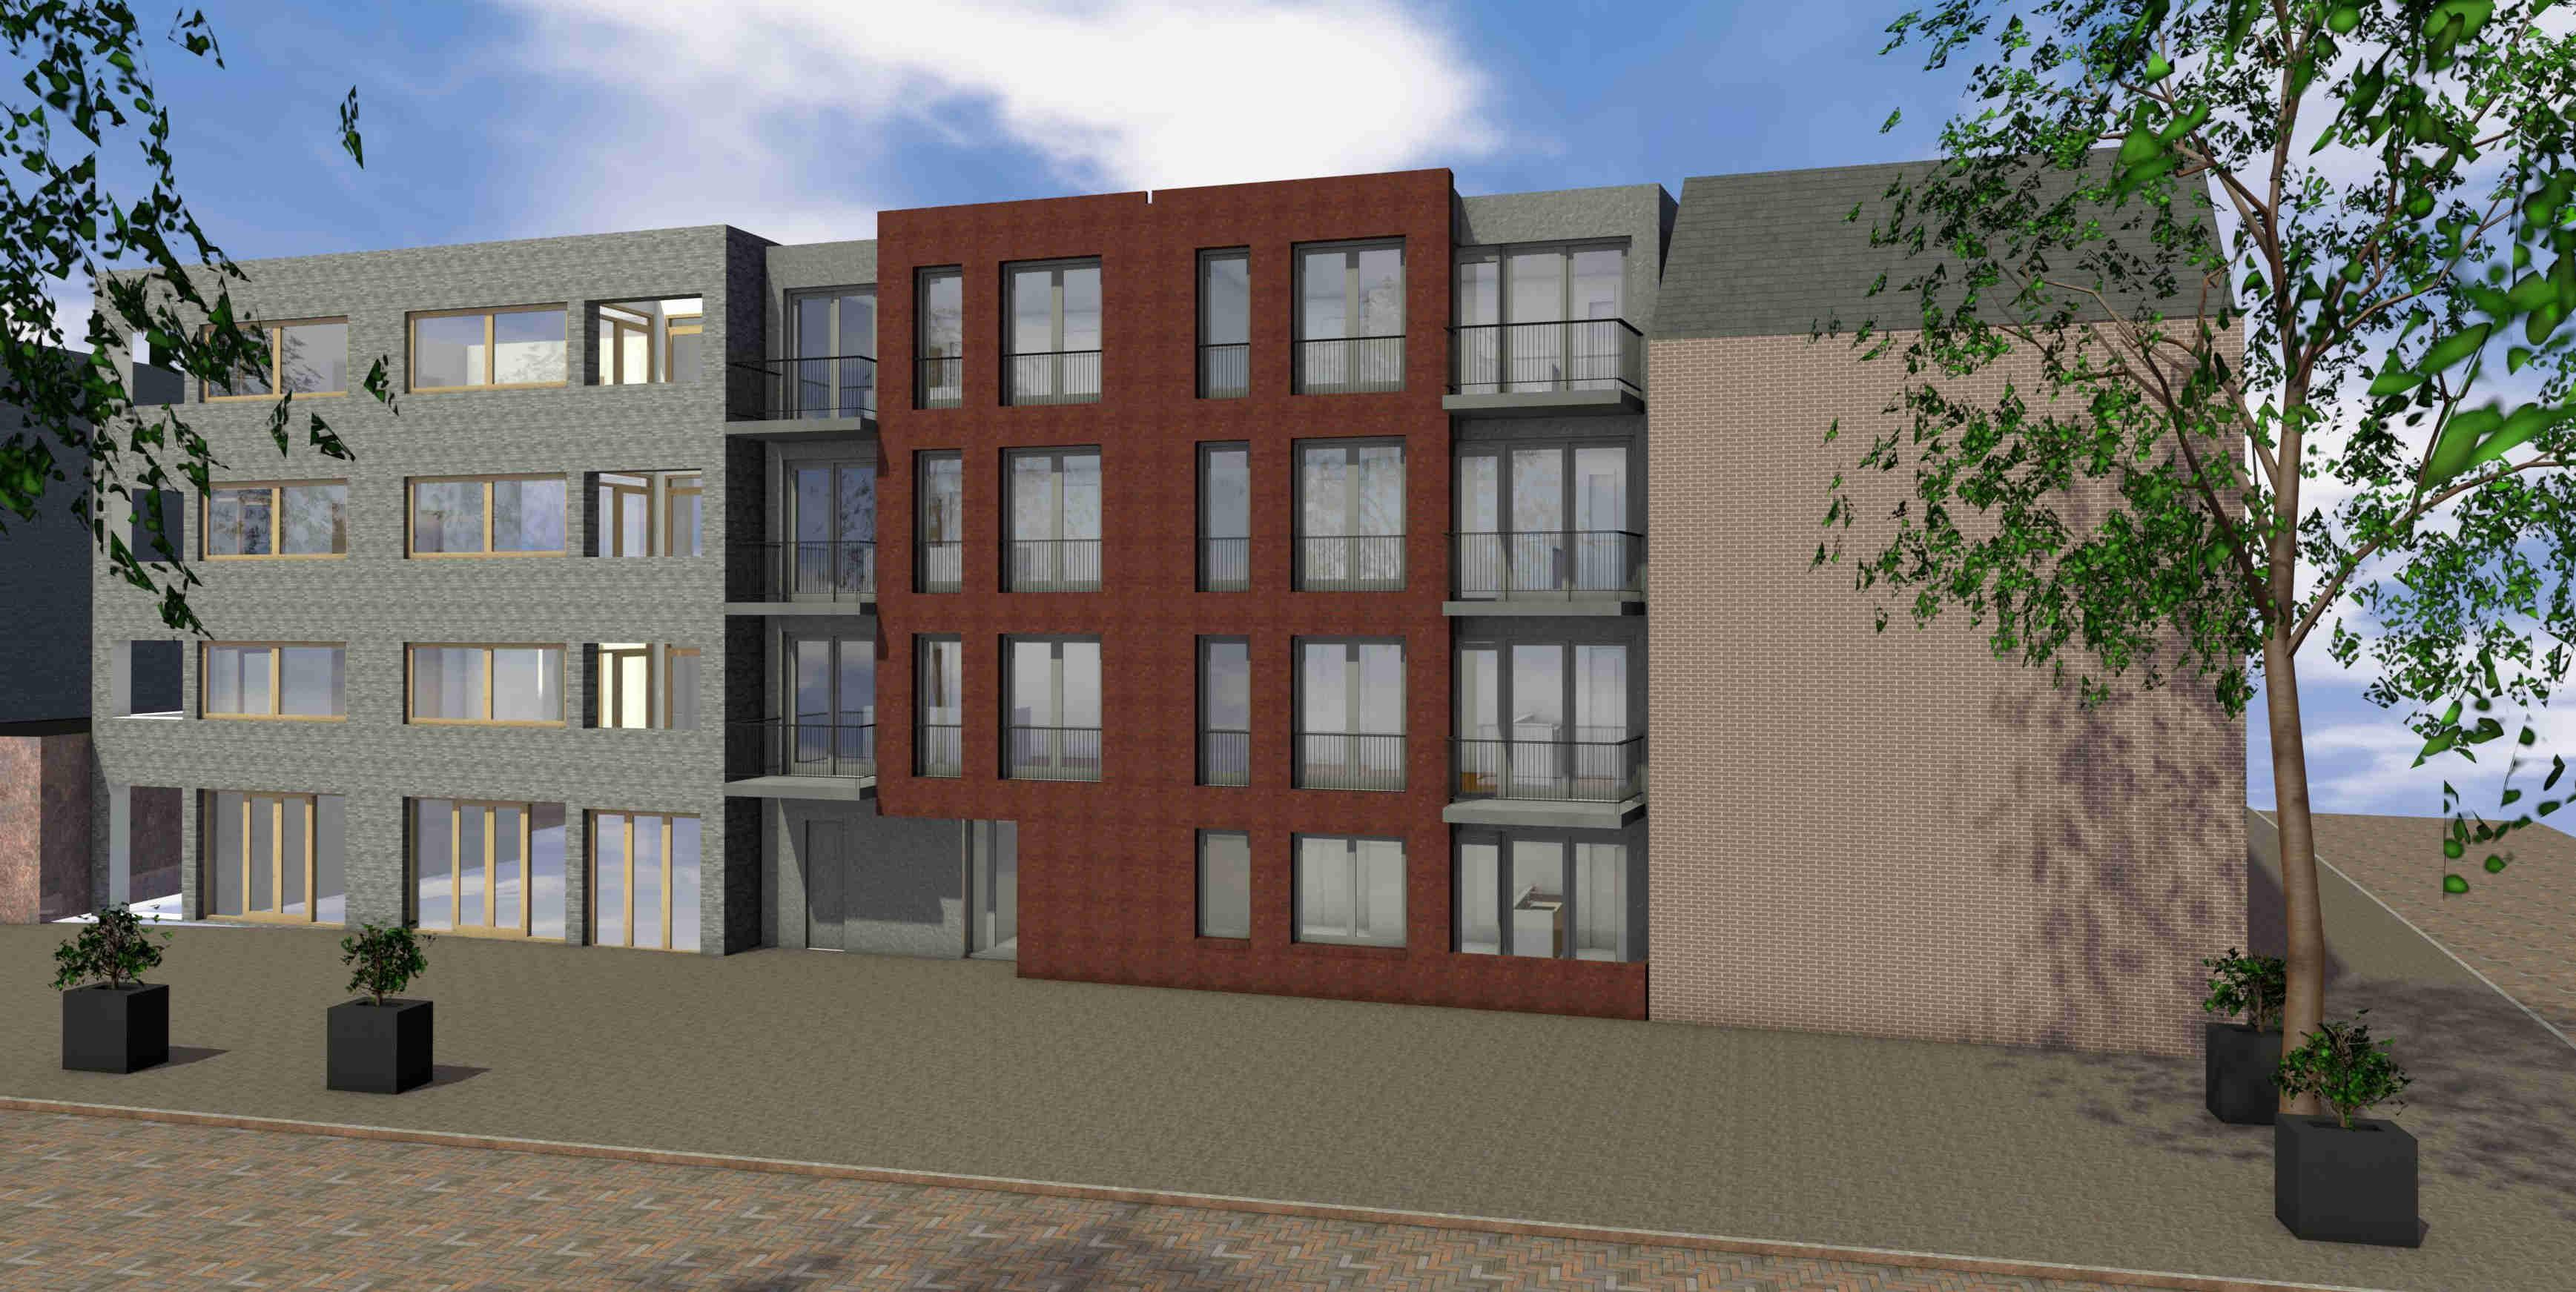 Nieuwbouw 7 appartementen Centrum Helmond